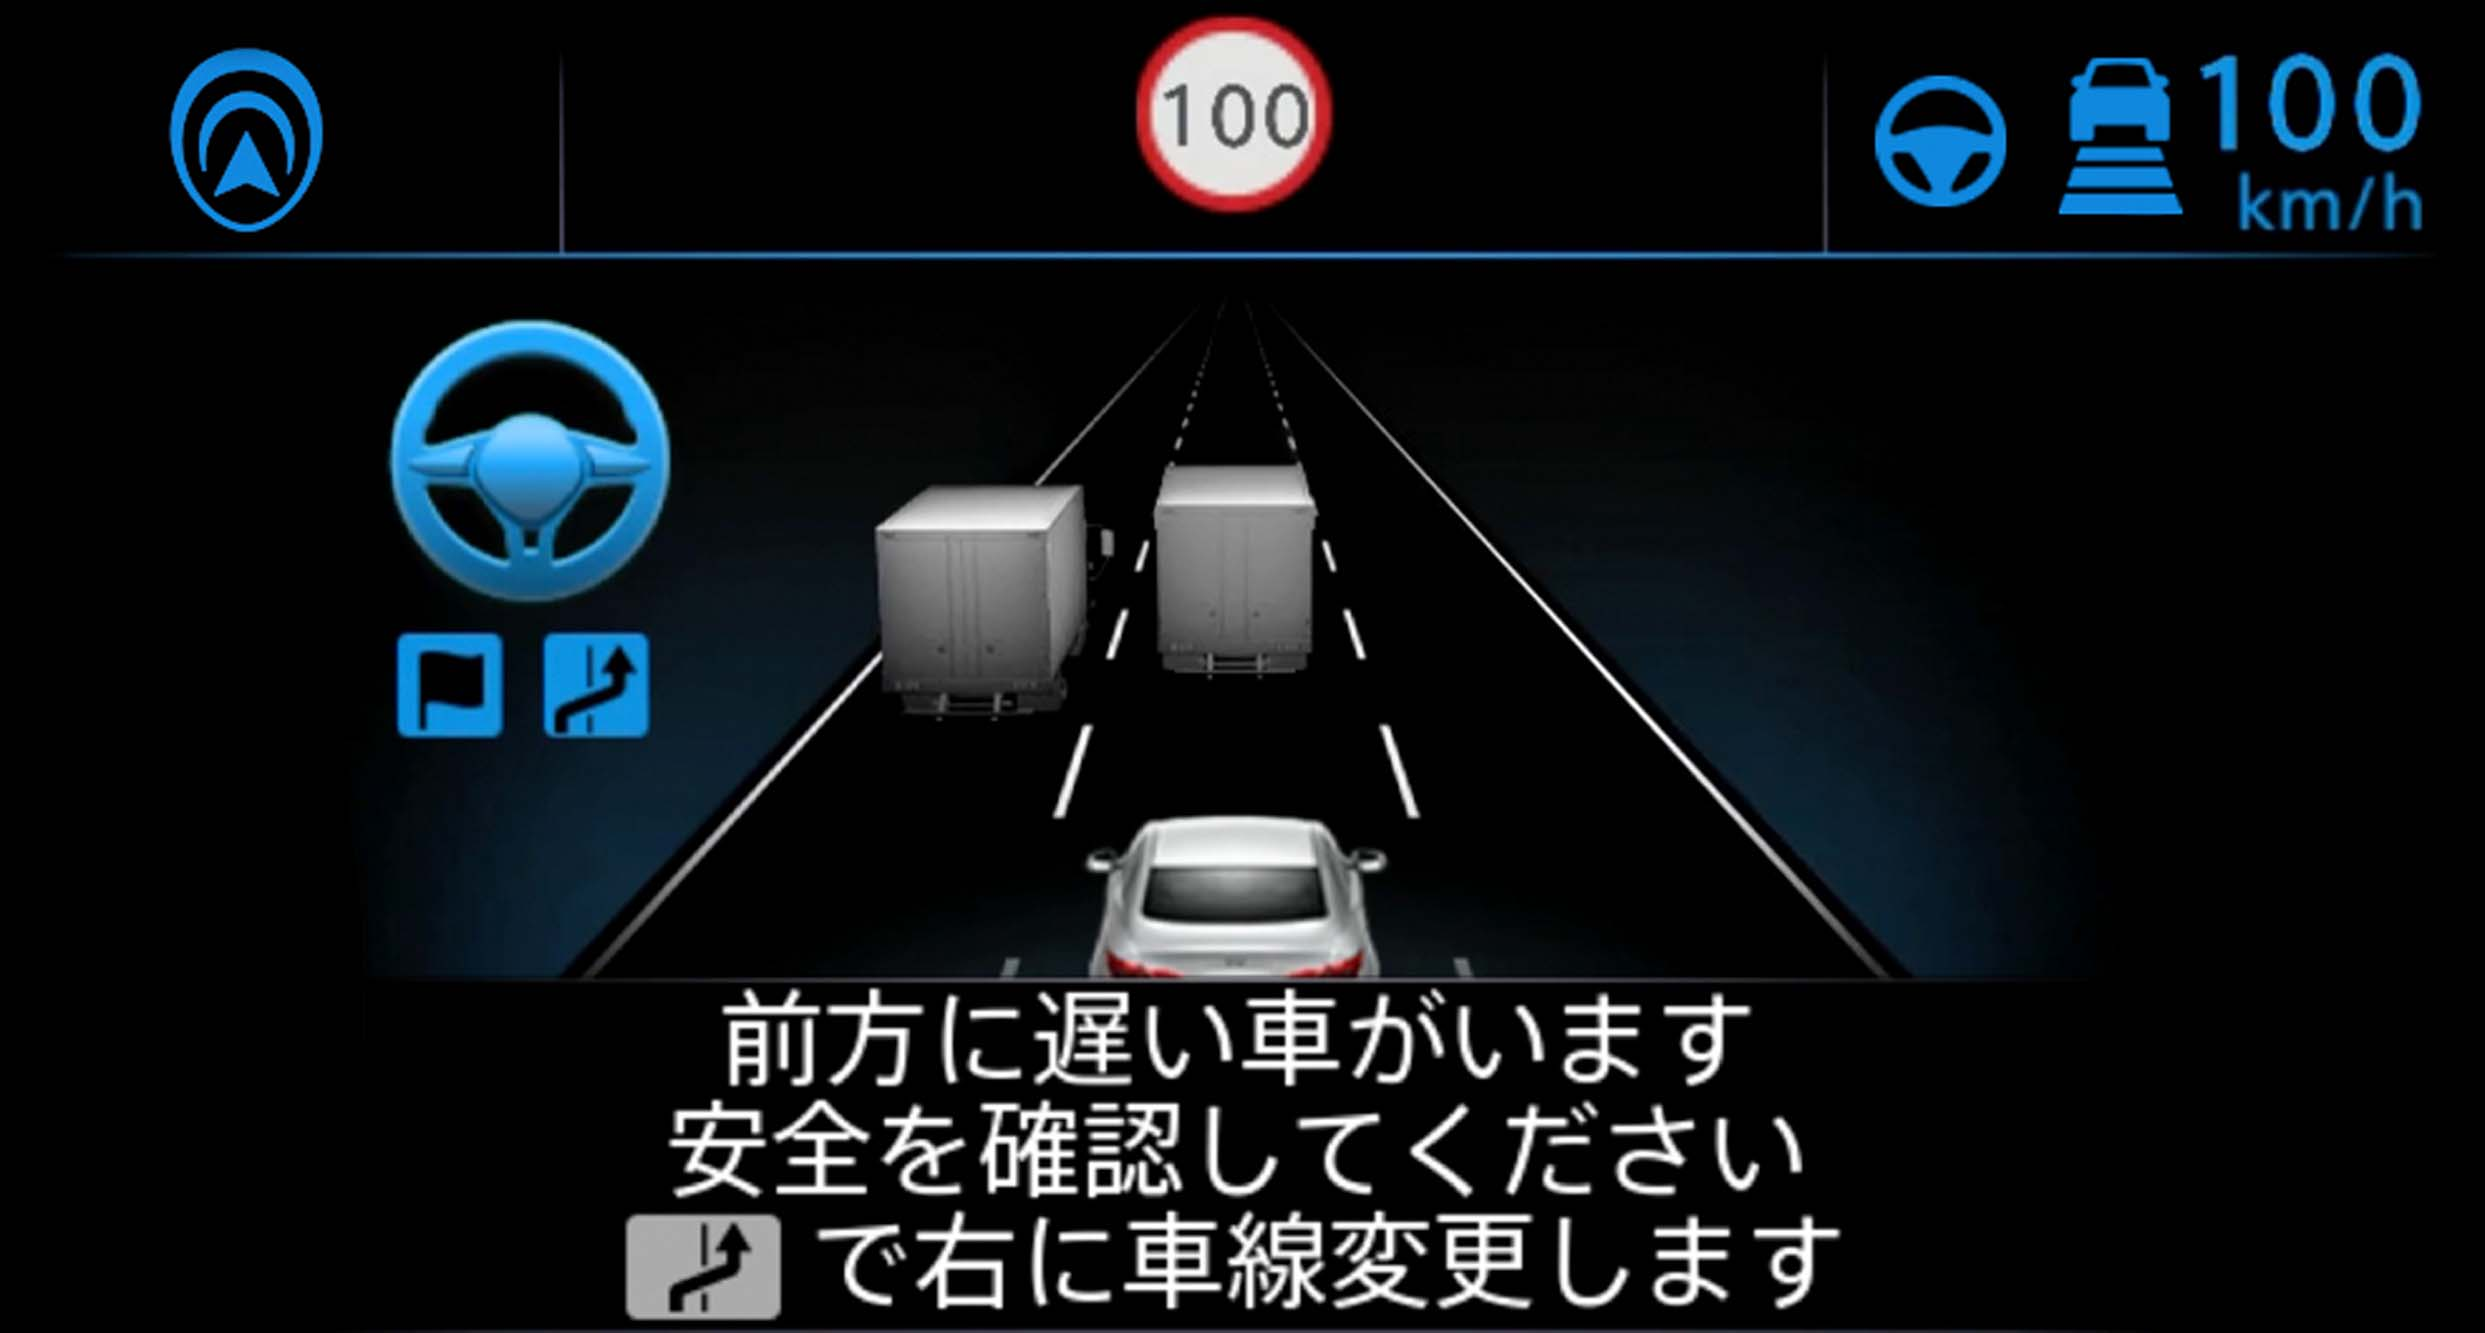 Japan-Market ProPILOT 2.0 hands-on notification display